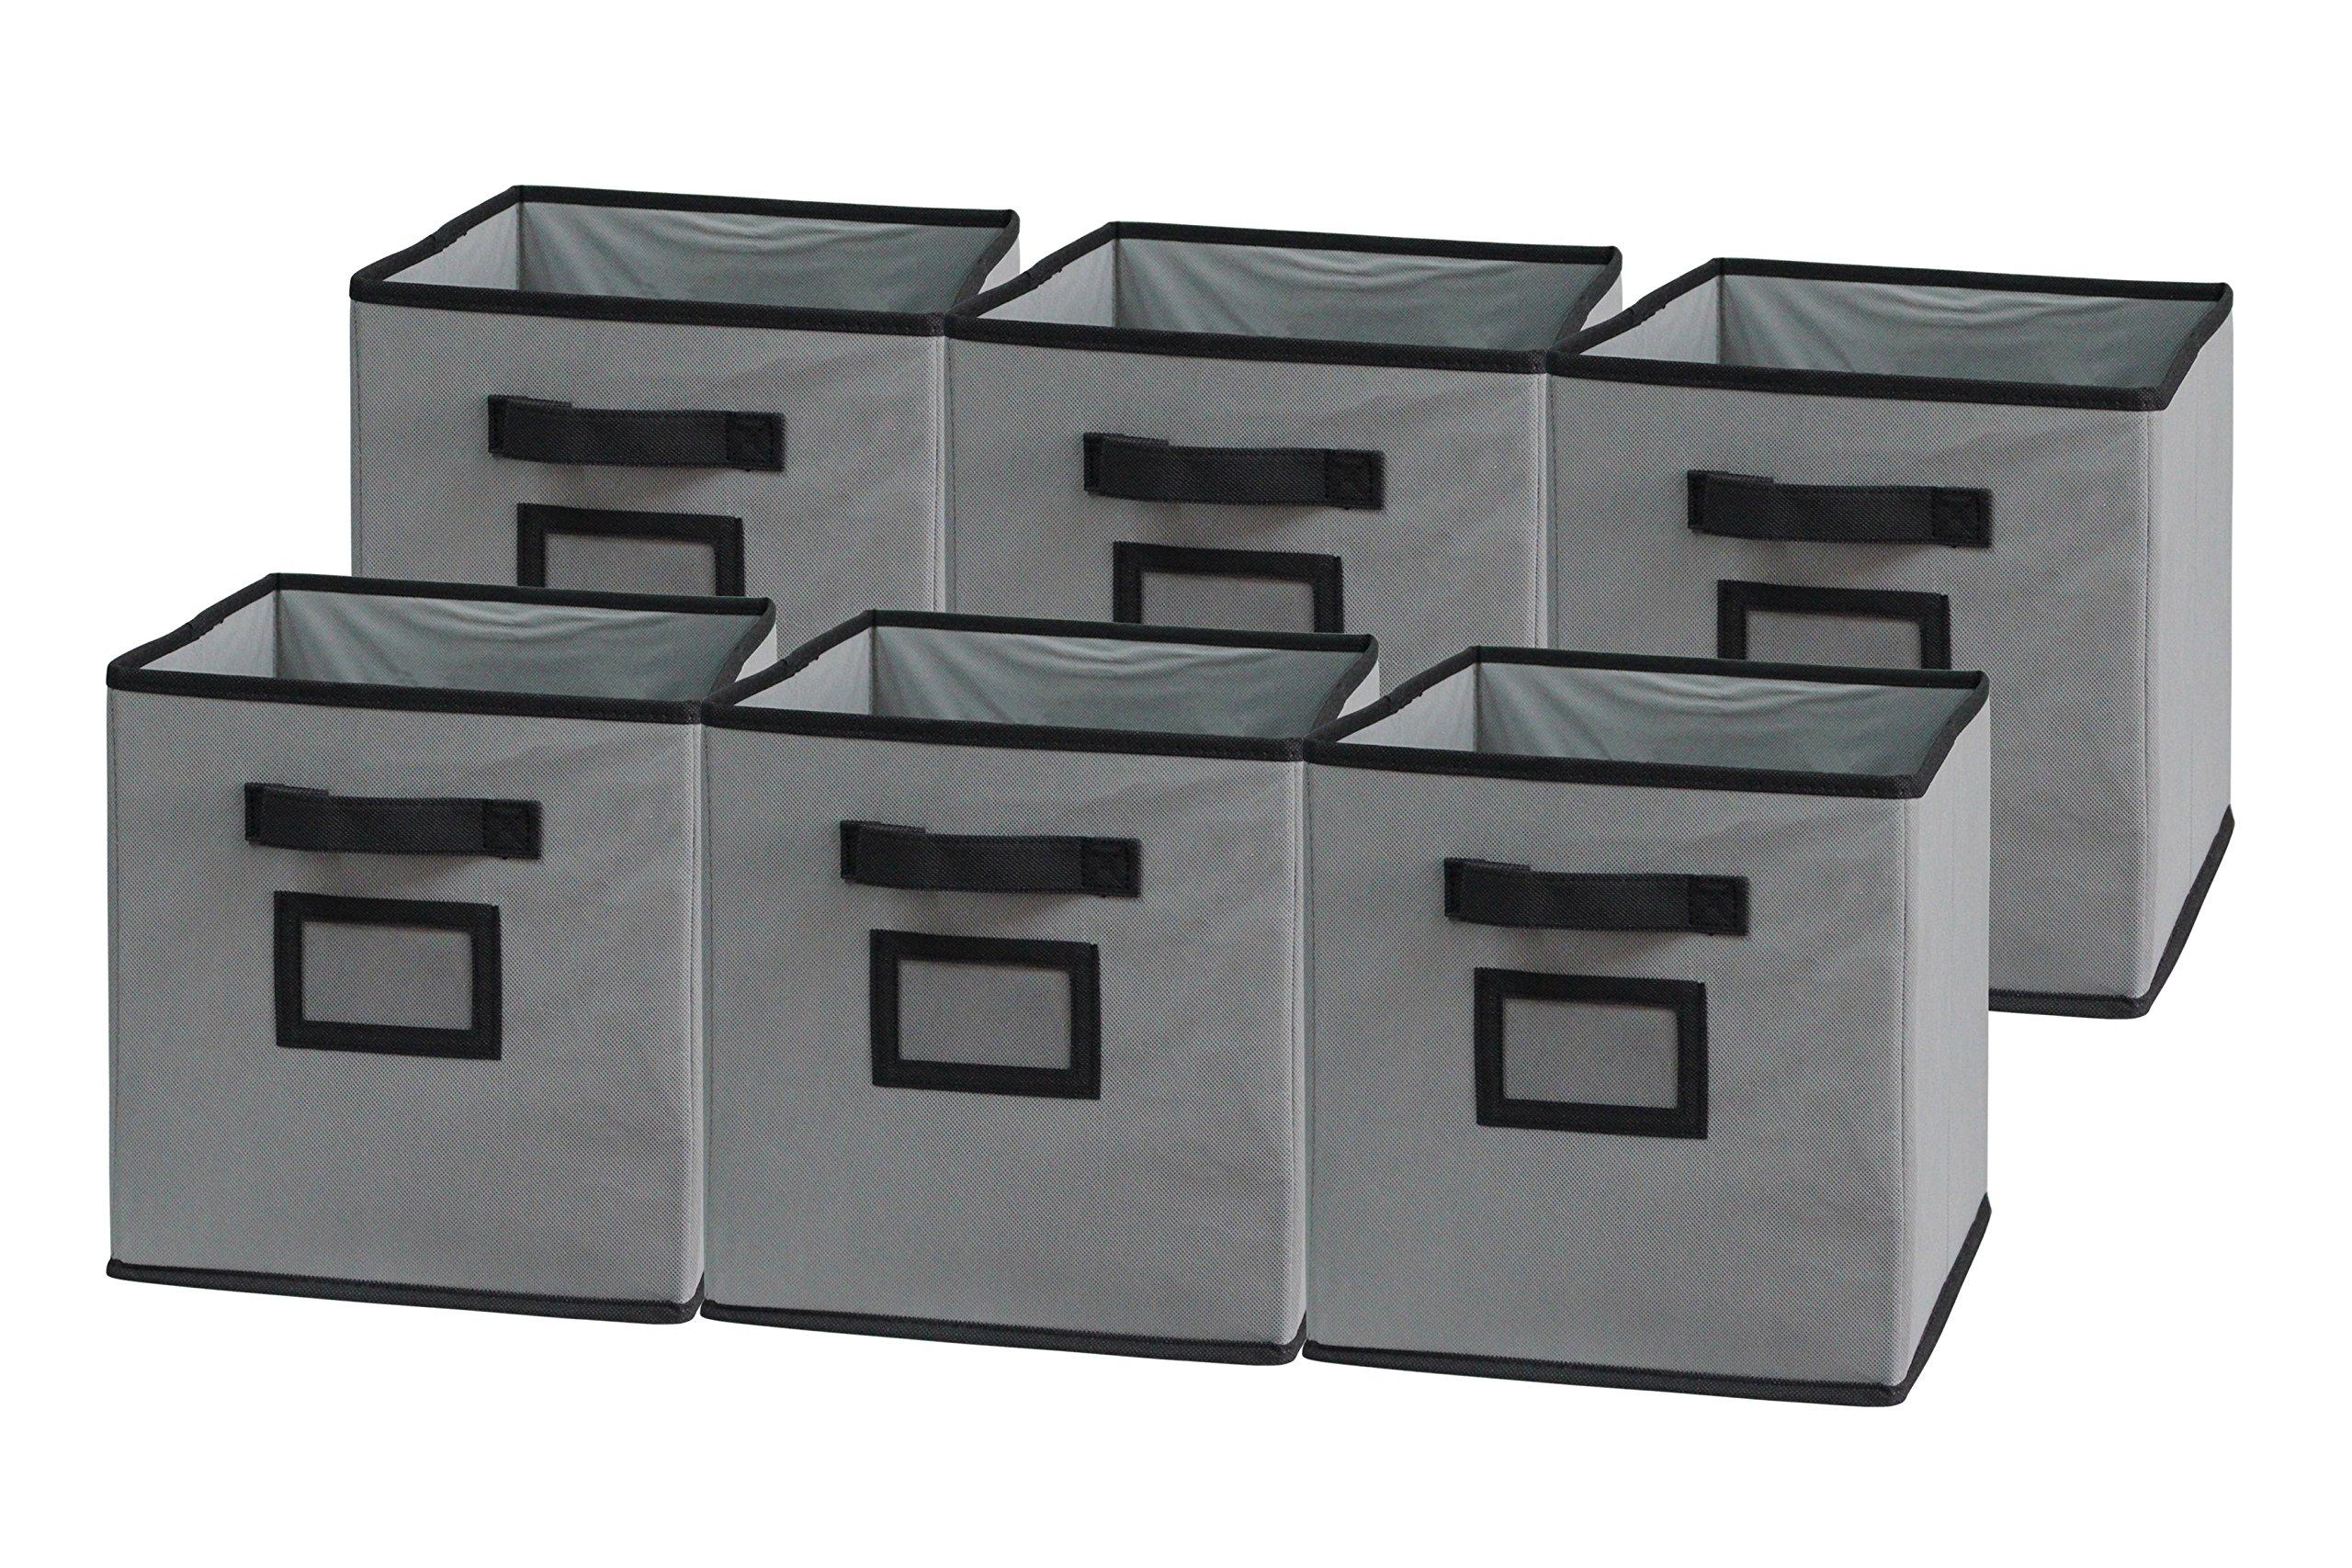 Sodynee Foldable Cloth Storage Cube Basket Bins Organizer Containers Drawers, 6 Pack, Black/Grey by Sodynee